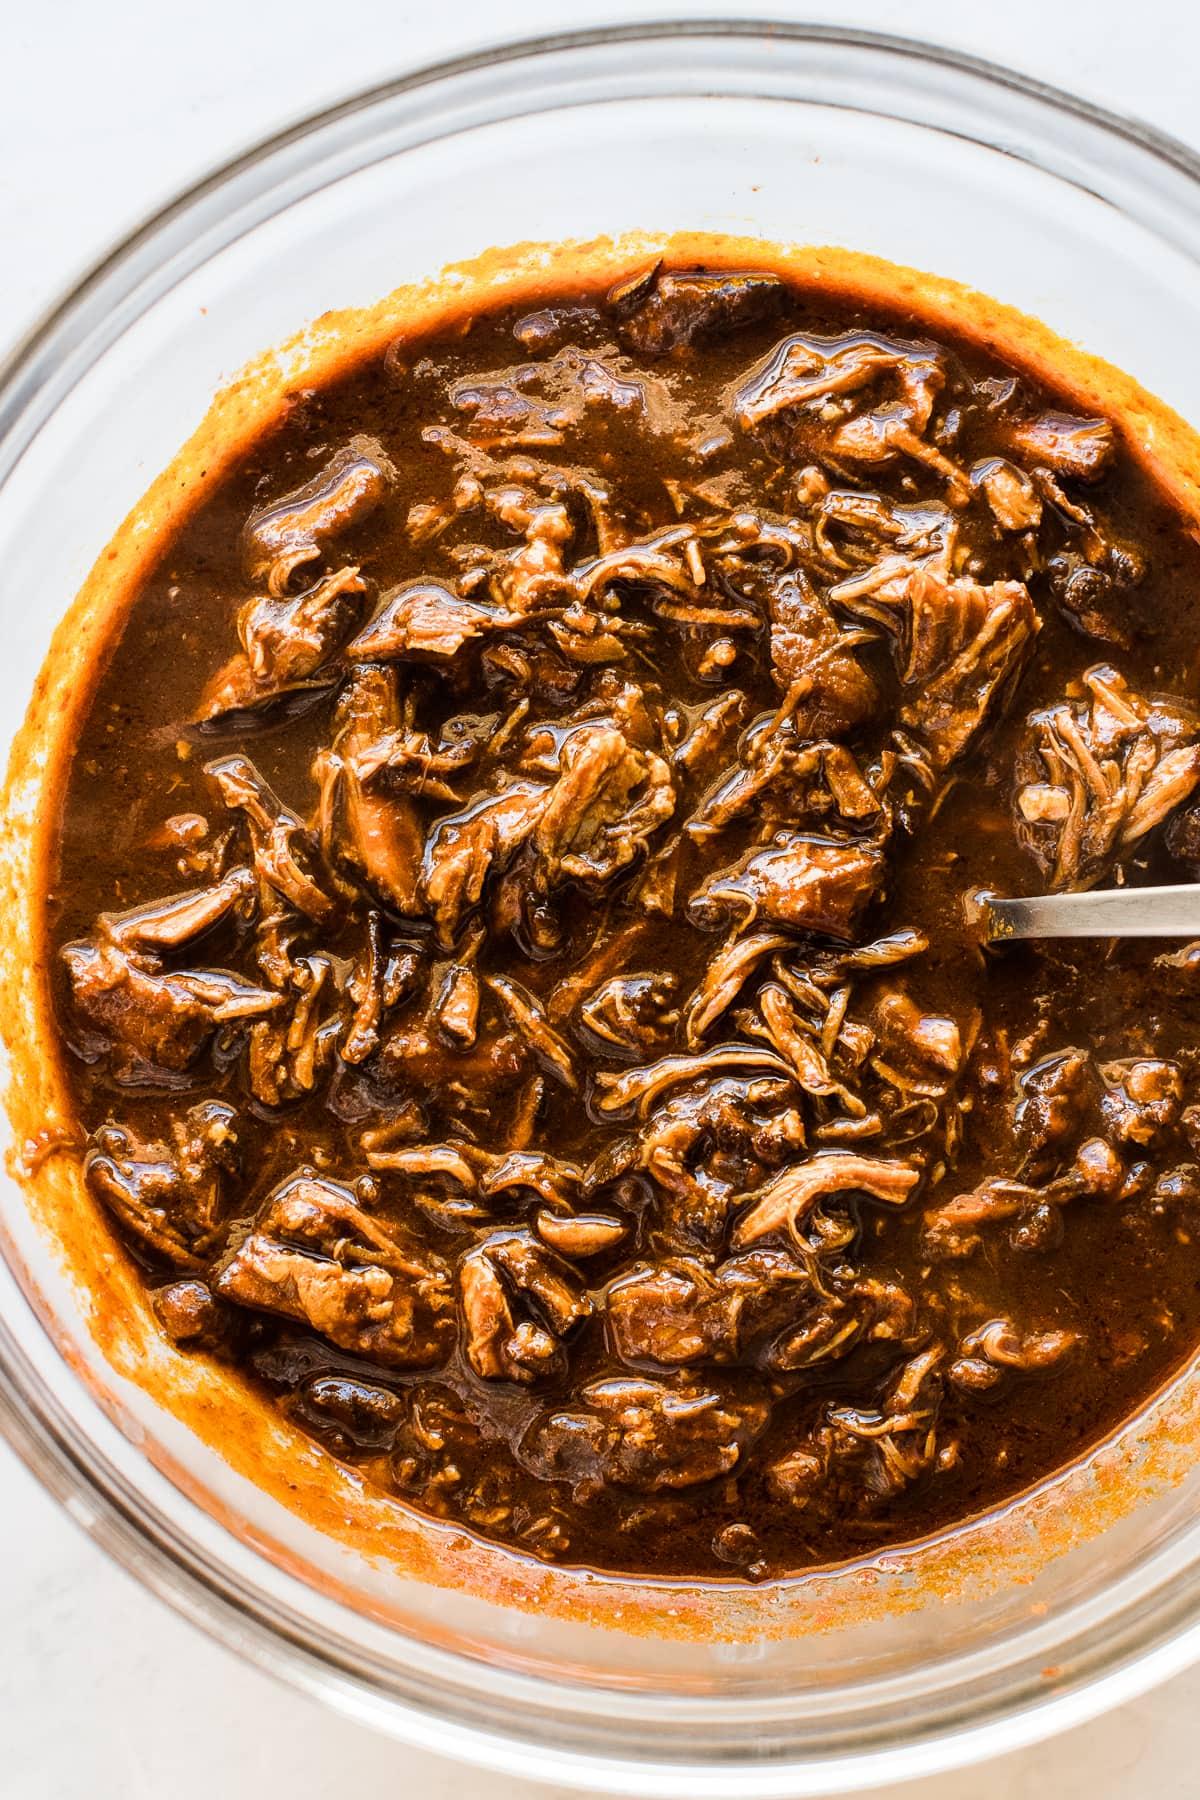 Pork in red chile sauce for Instant Pot Pork Tamales